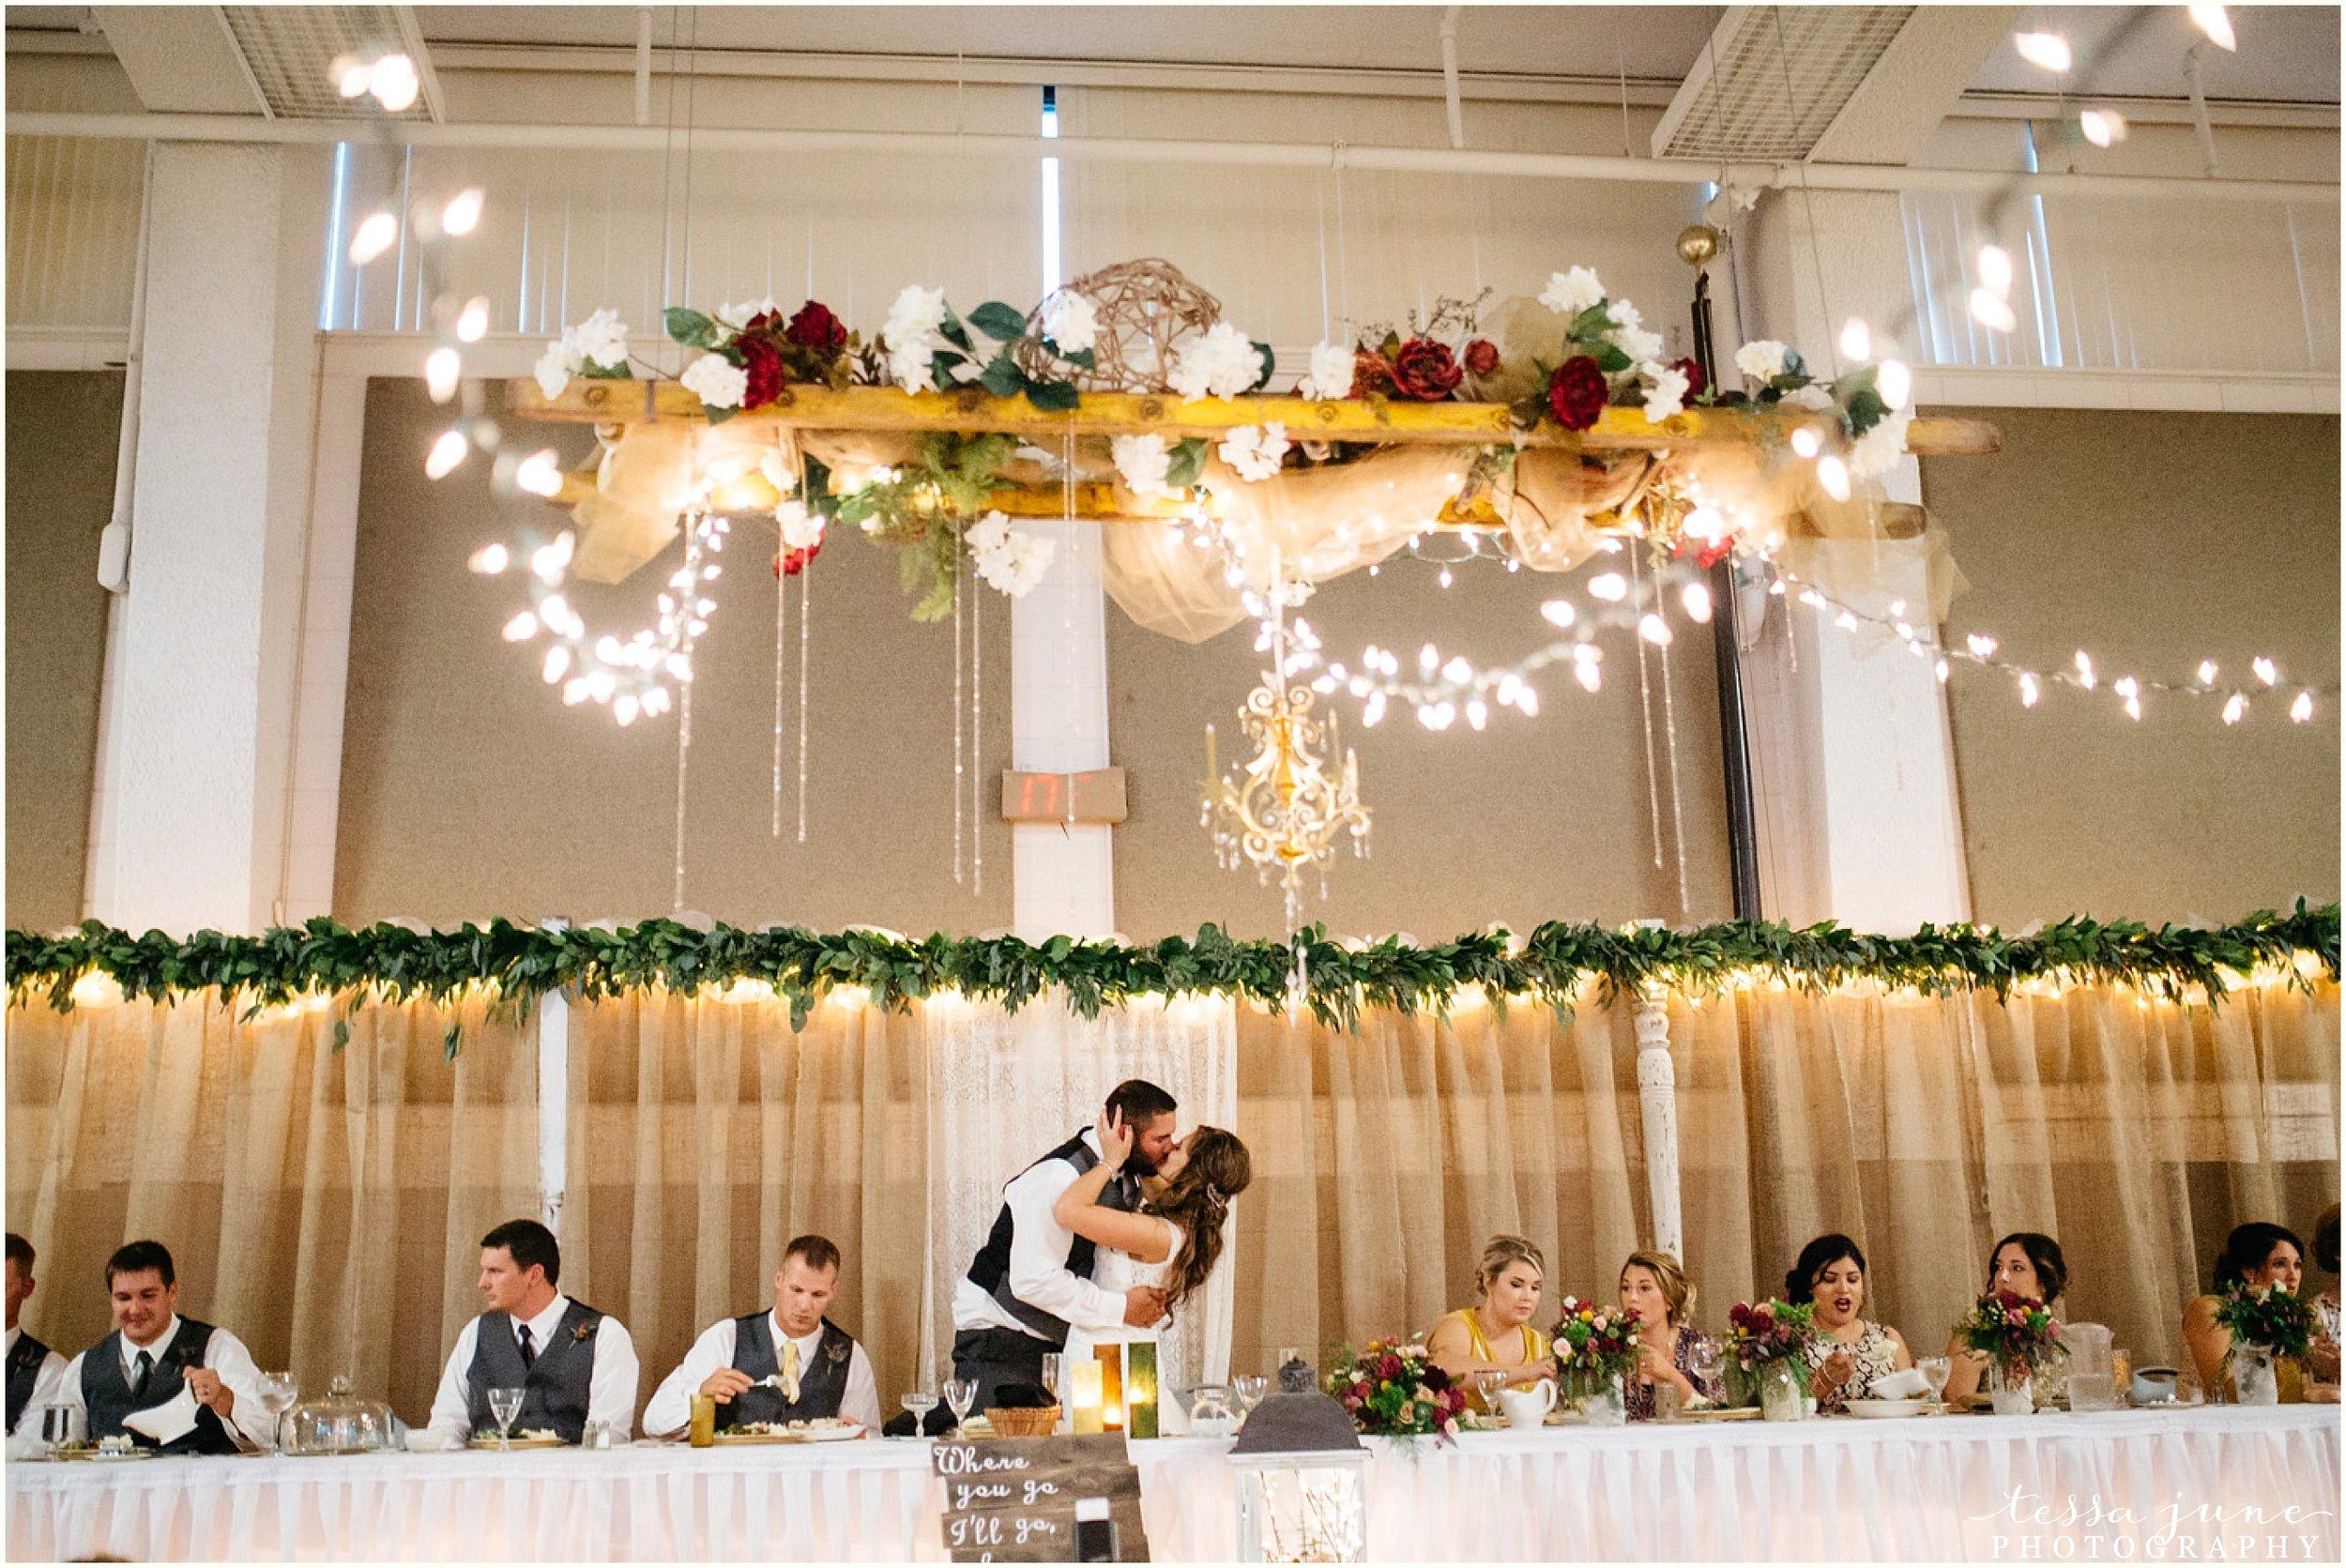 bohemian-minnesota-wedding-mismatched-bridesmaid-dresses-waterfall-st-cloud-tessa-june-photography-159.jpg